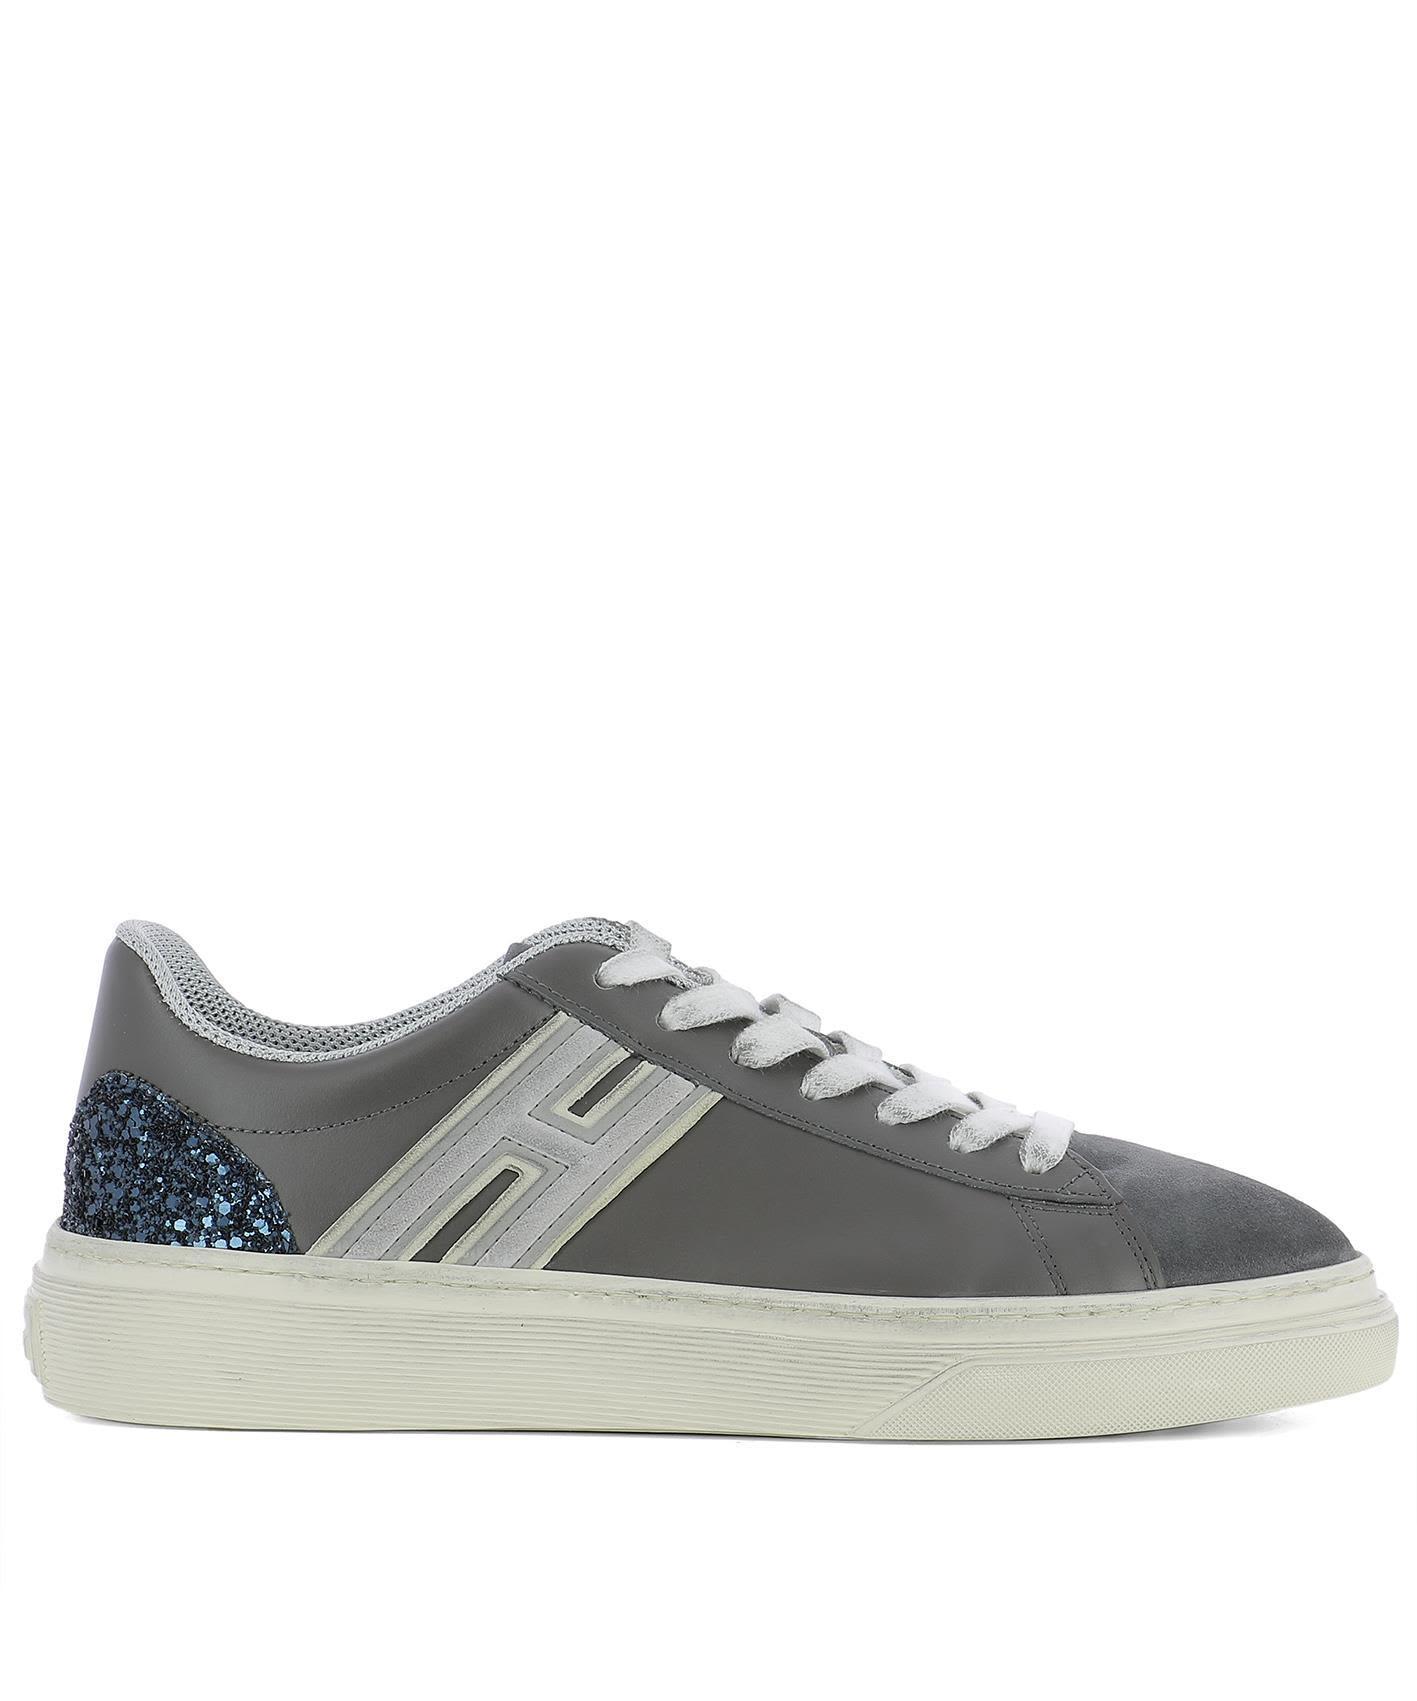 Hogan Grey Leather Sneakers